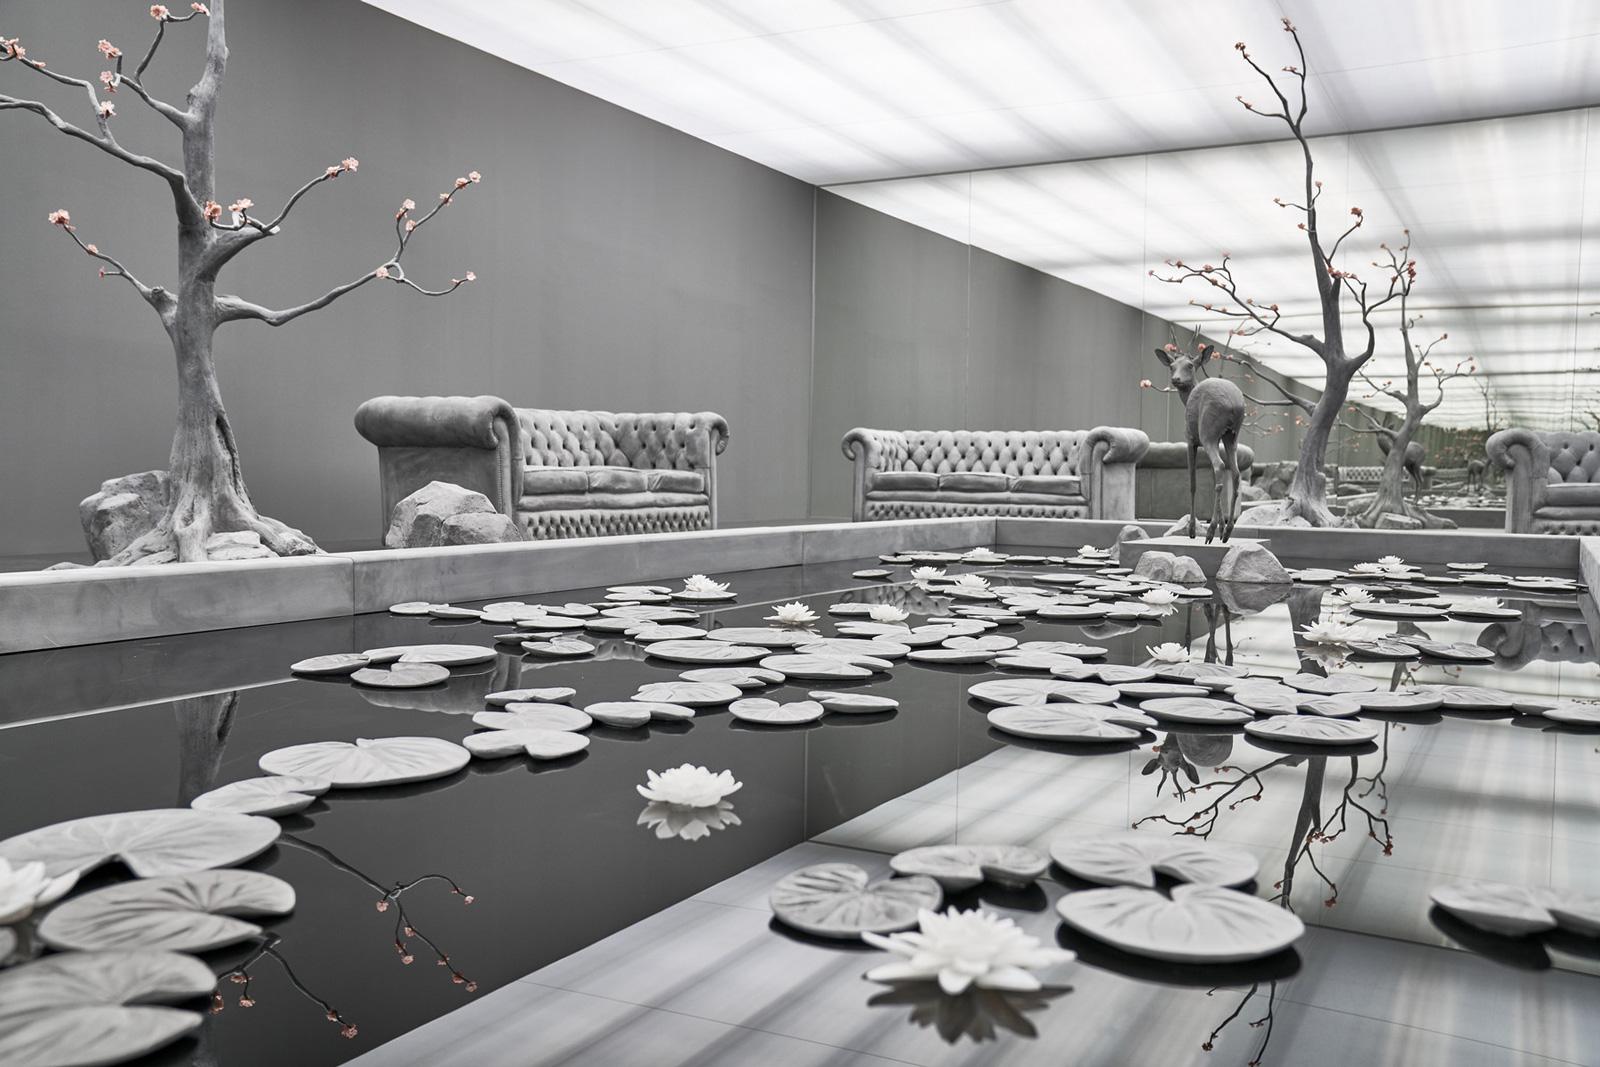 Hans Op de Beeck, The Garden Room, sculptural installation, 2017